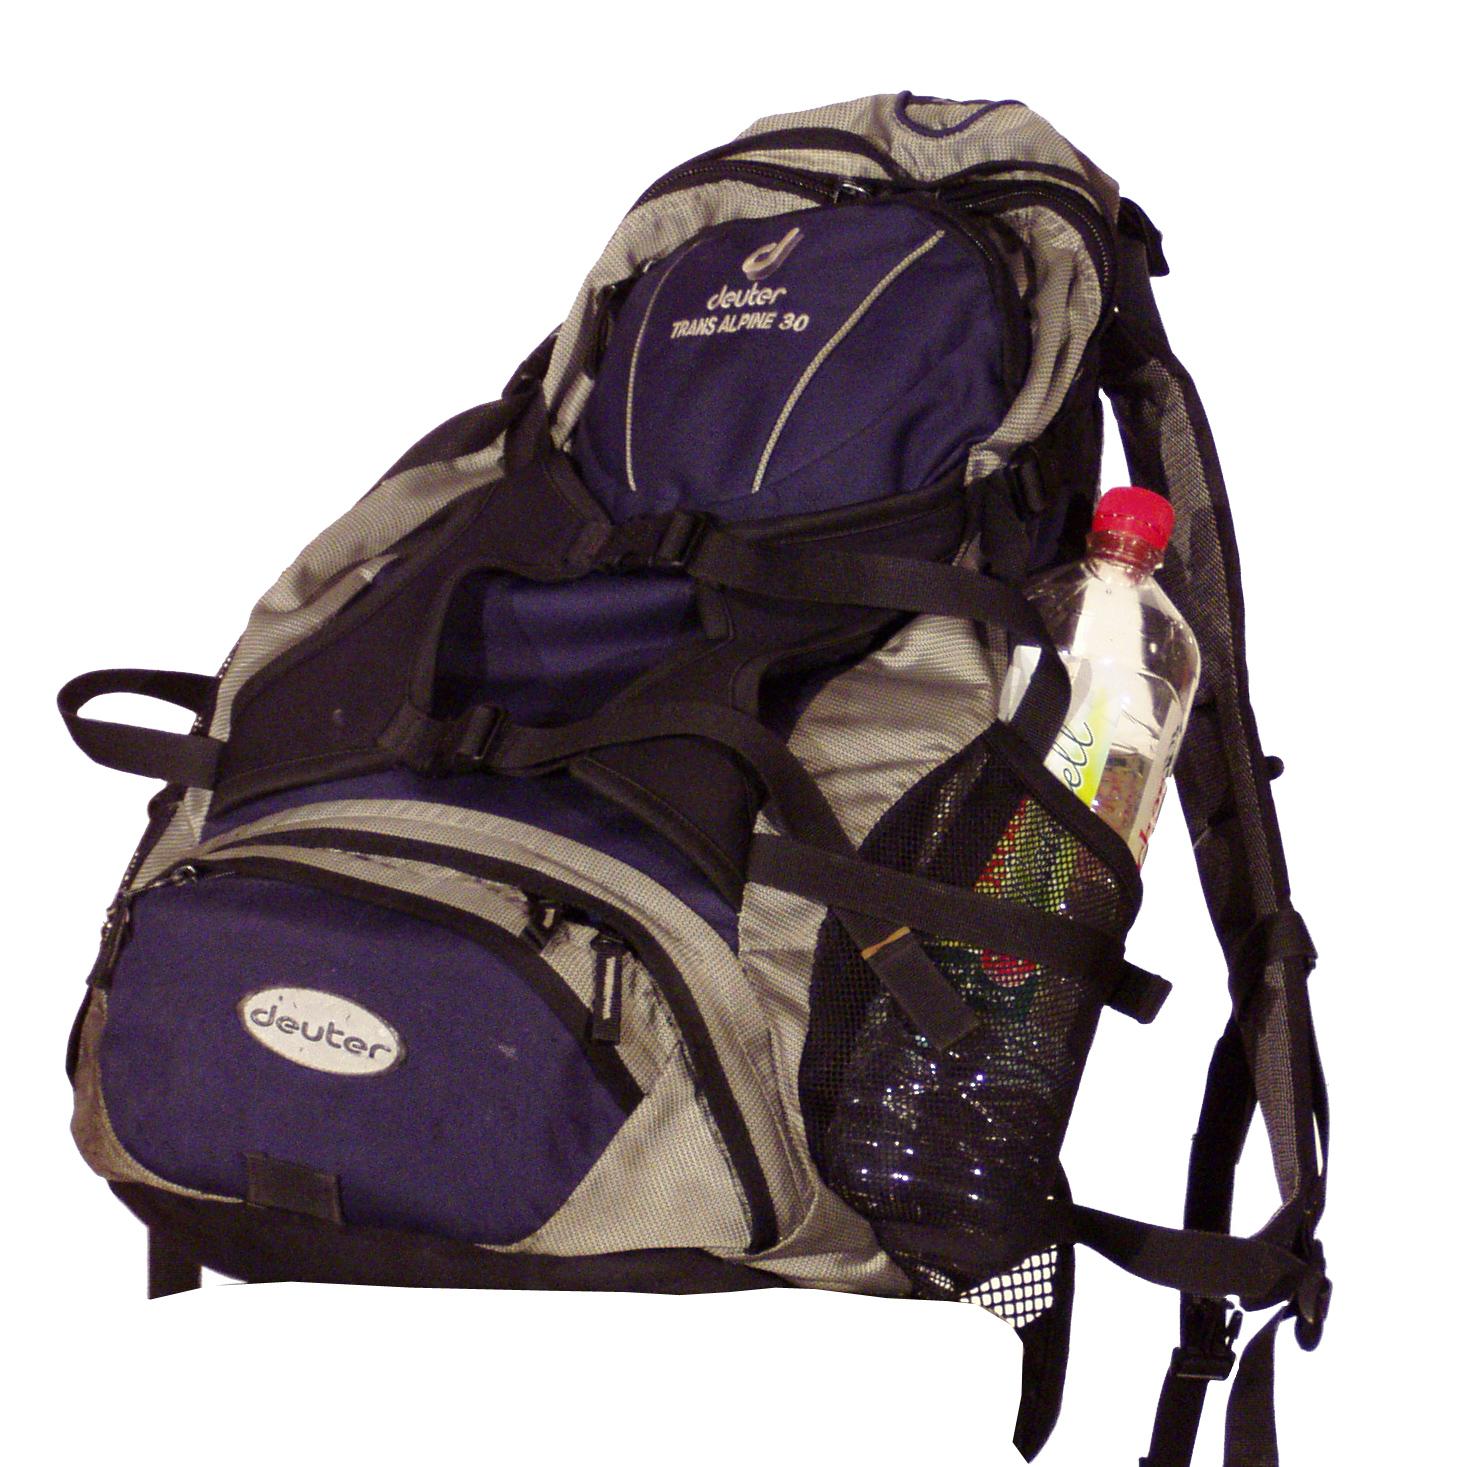 Preparing a Get-Home Bag